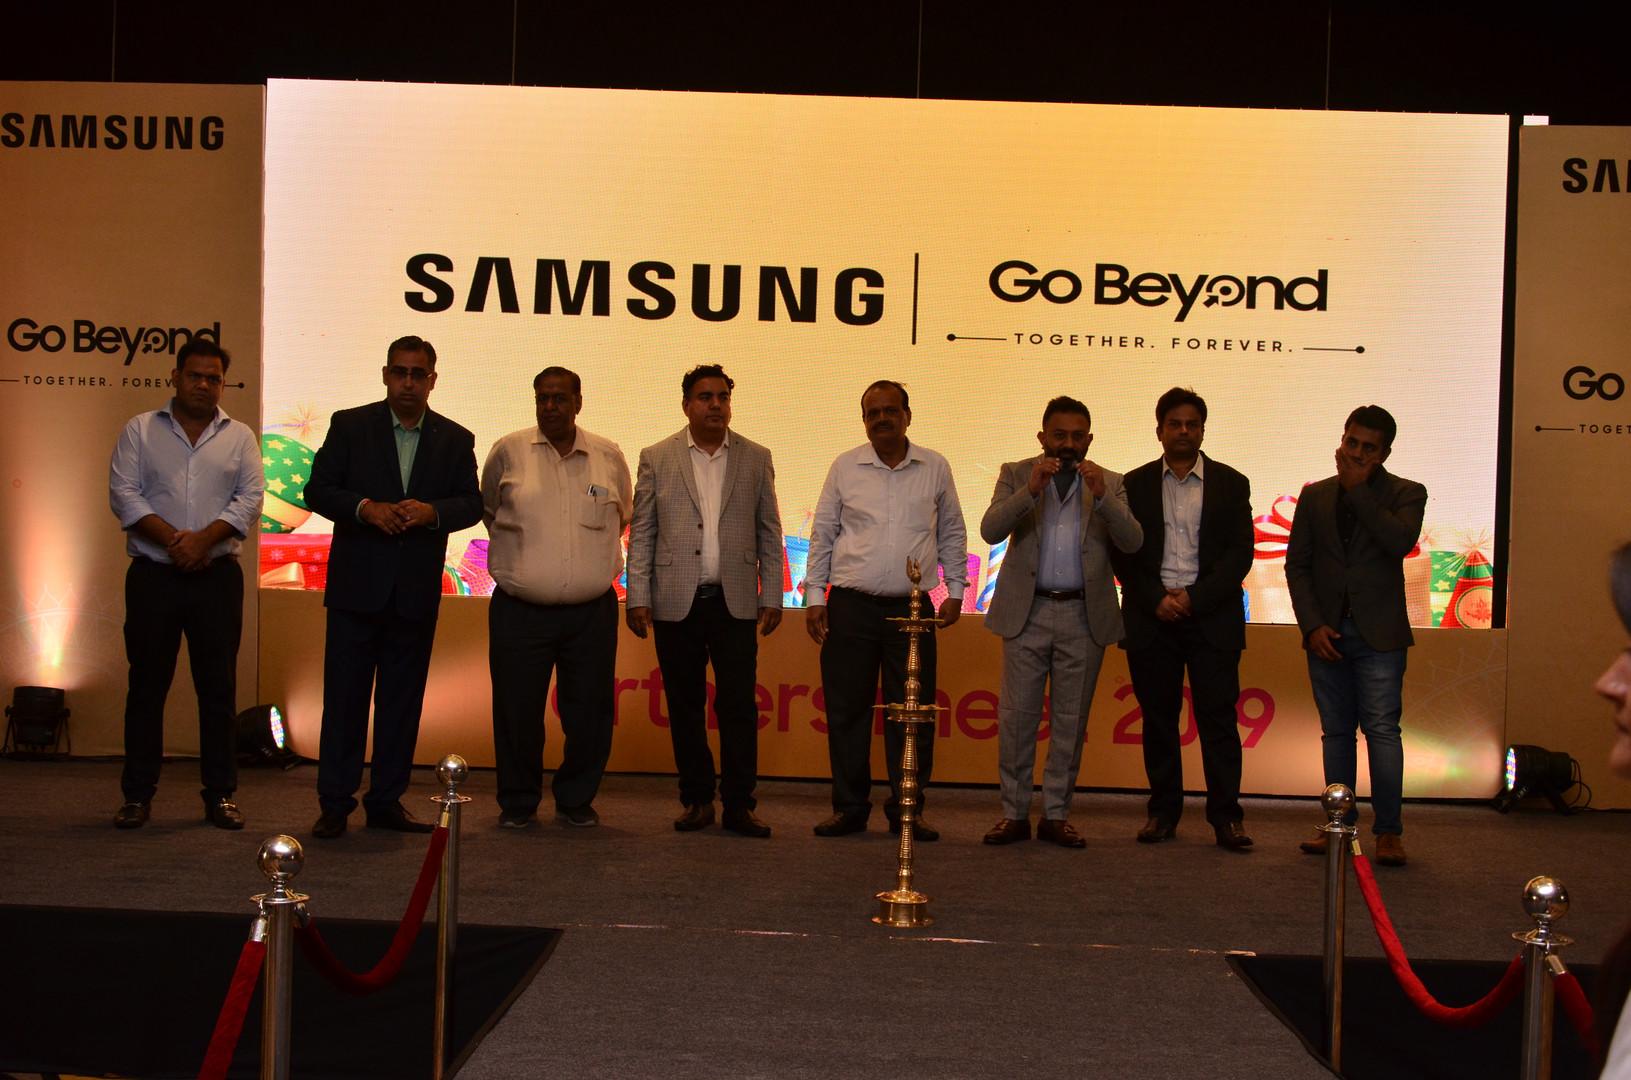 Samsung Events 009.JPG